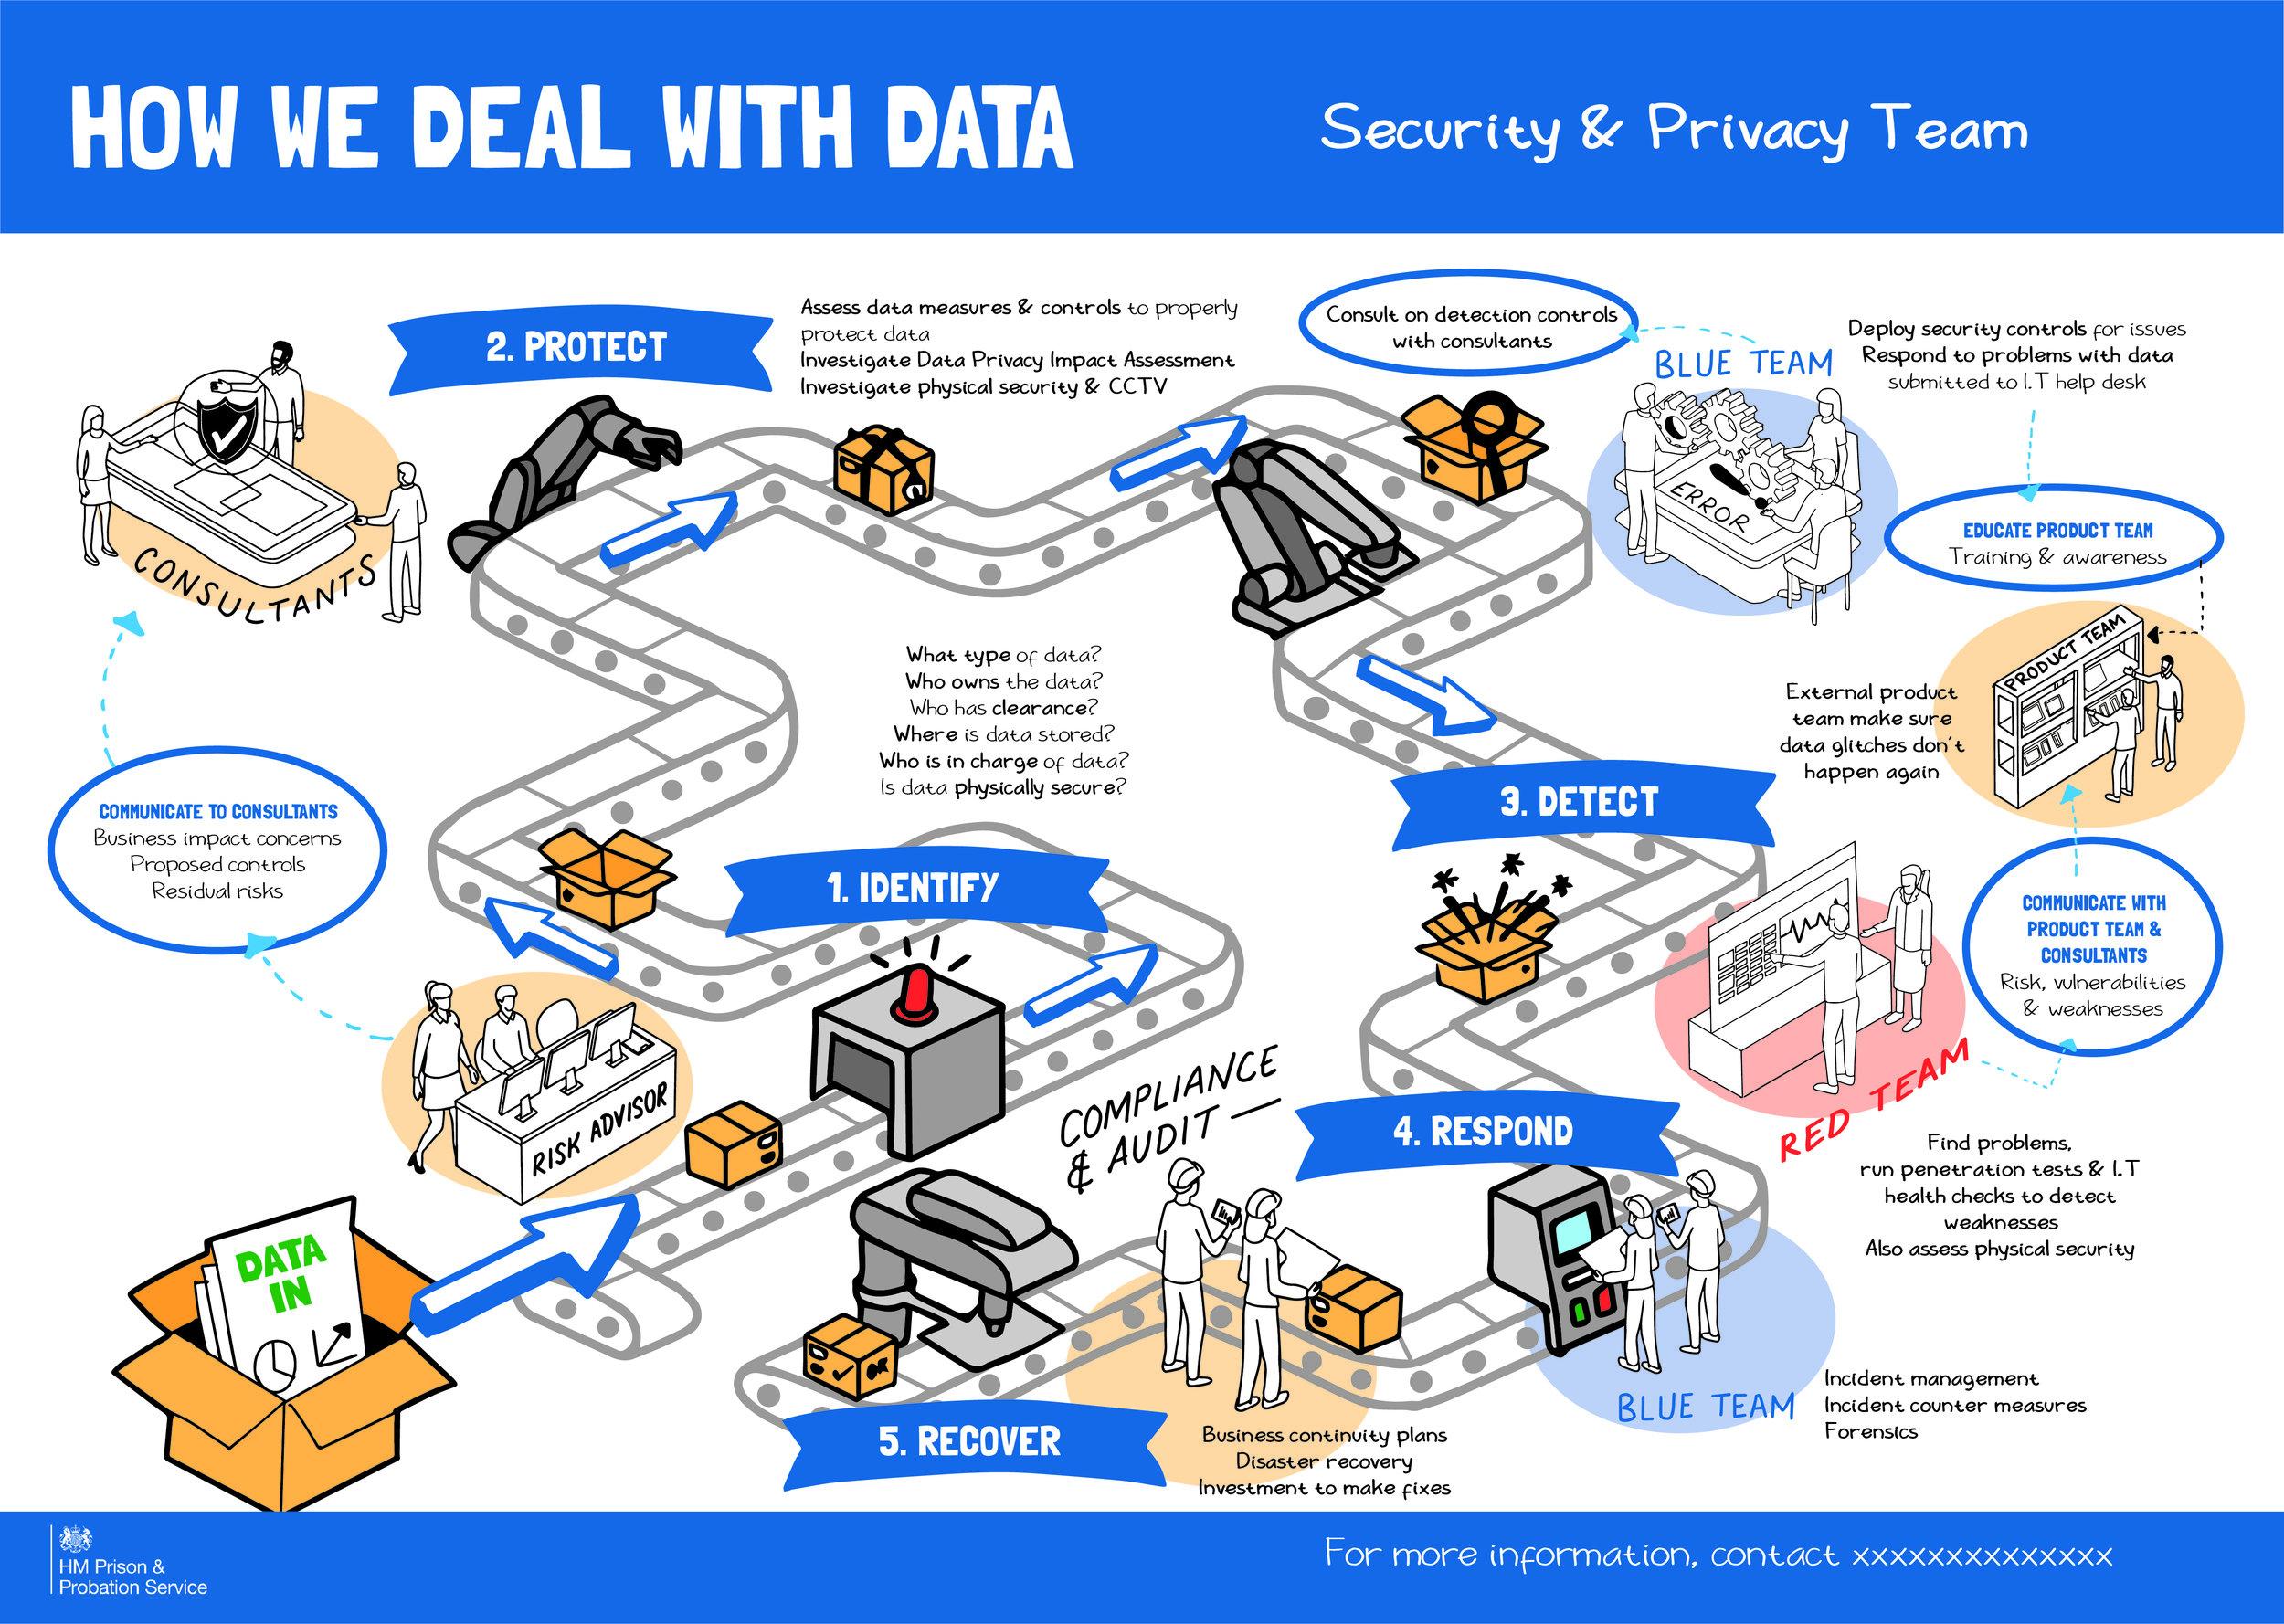 Digital_Studio_Security&Privacy-01.jpg